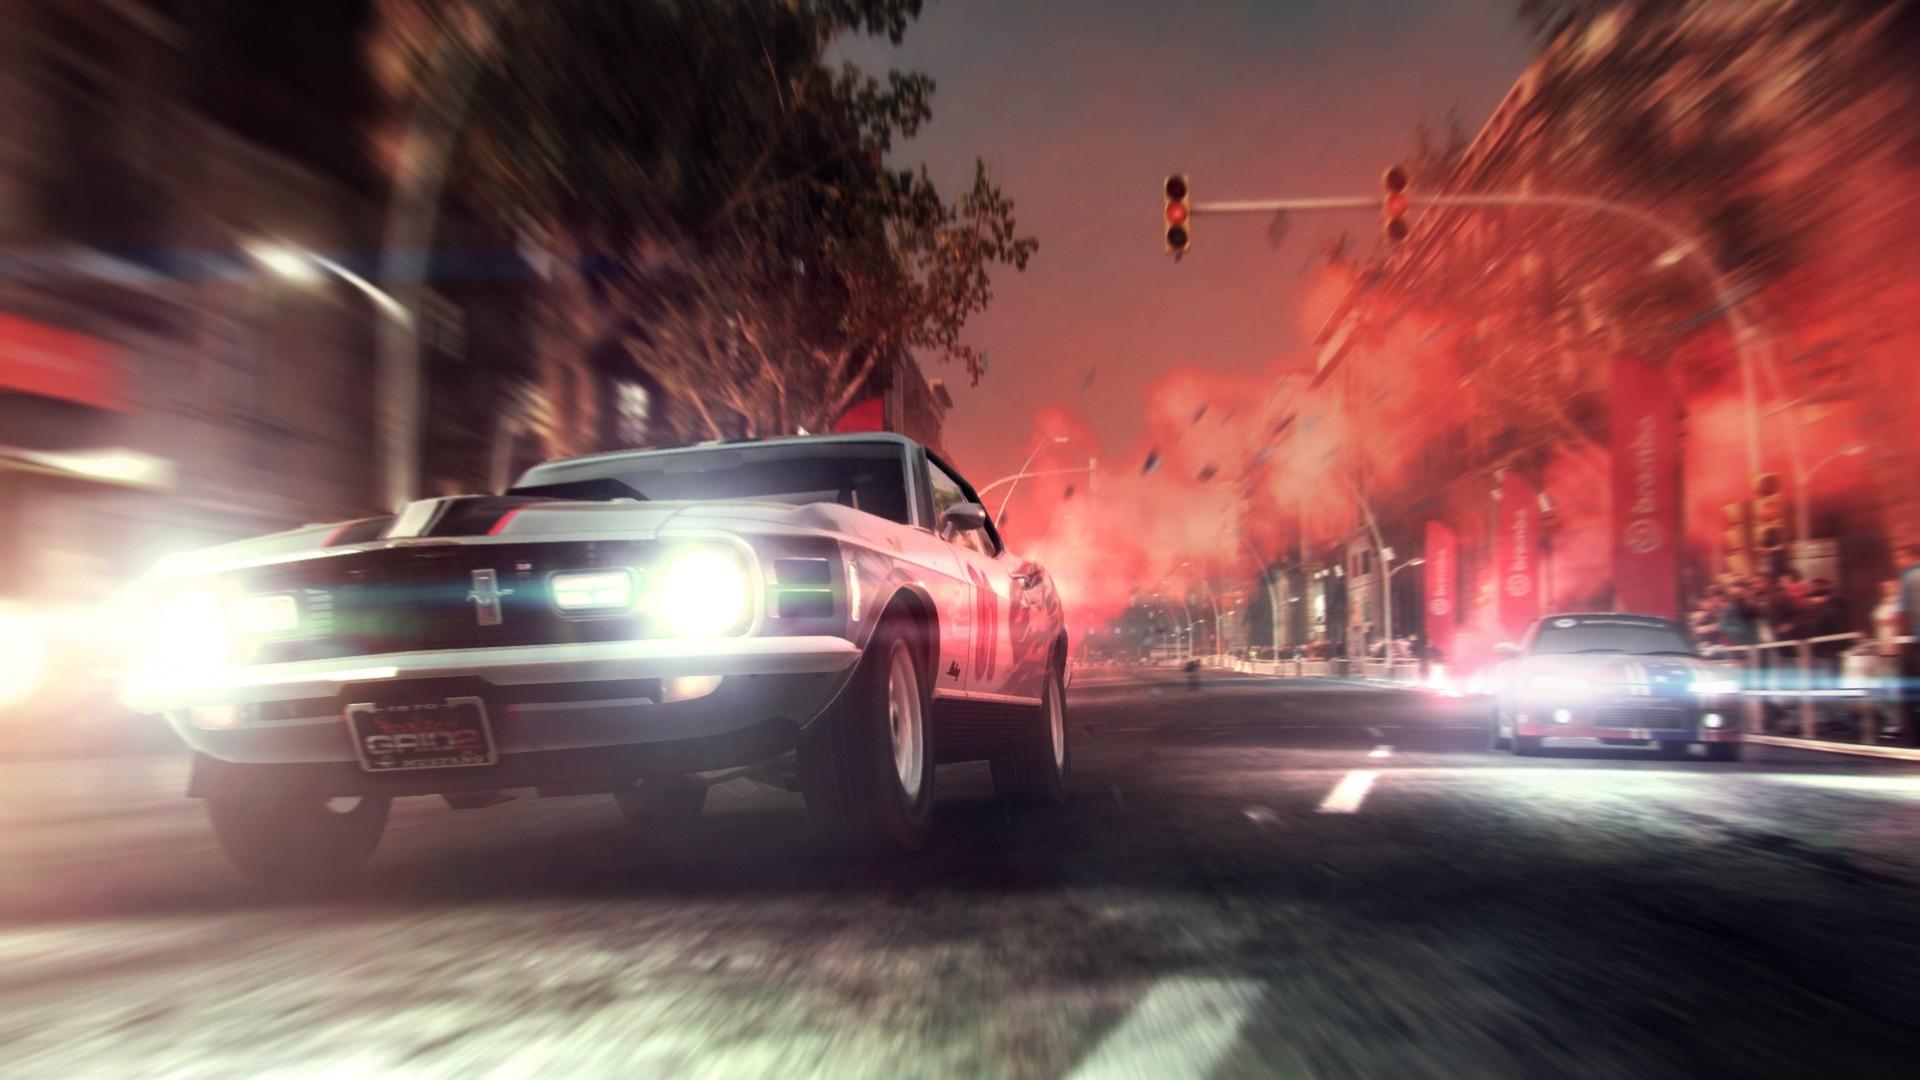 Wallpaper : video games, street, night, race cars, vehicle